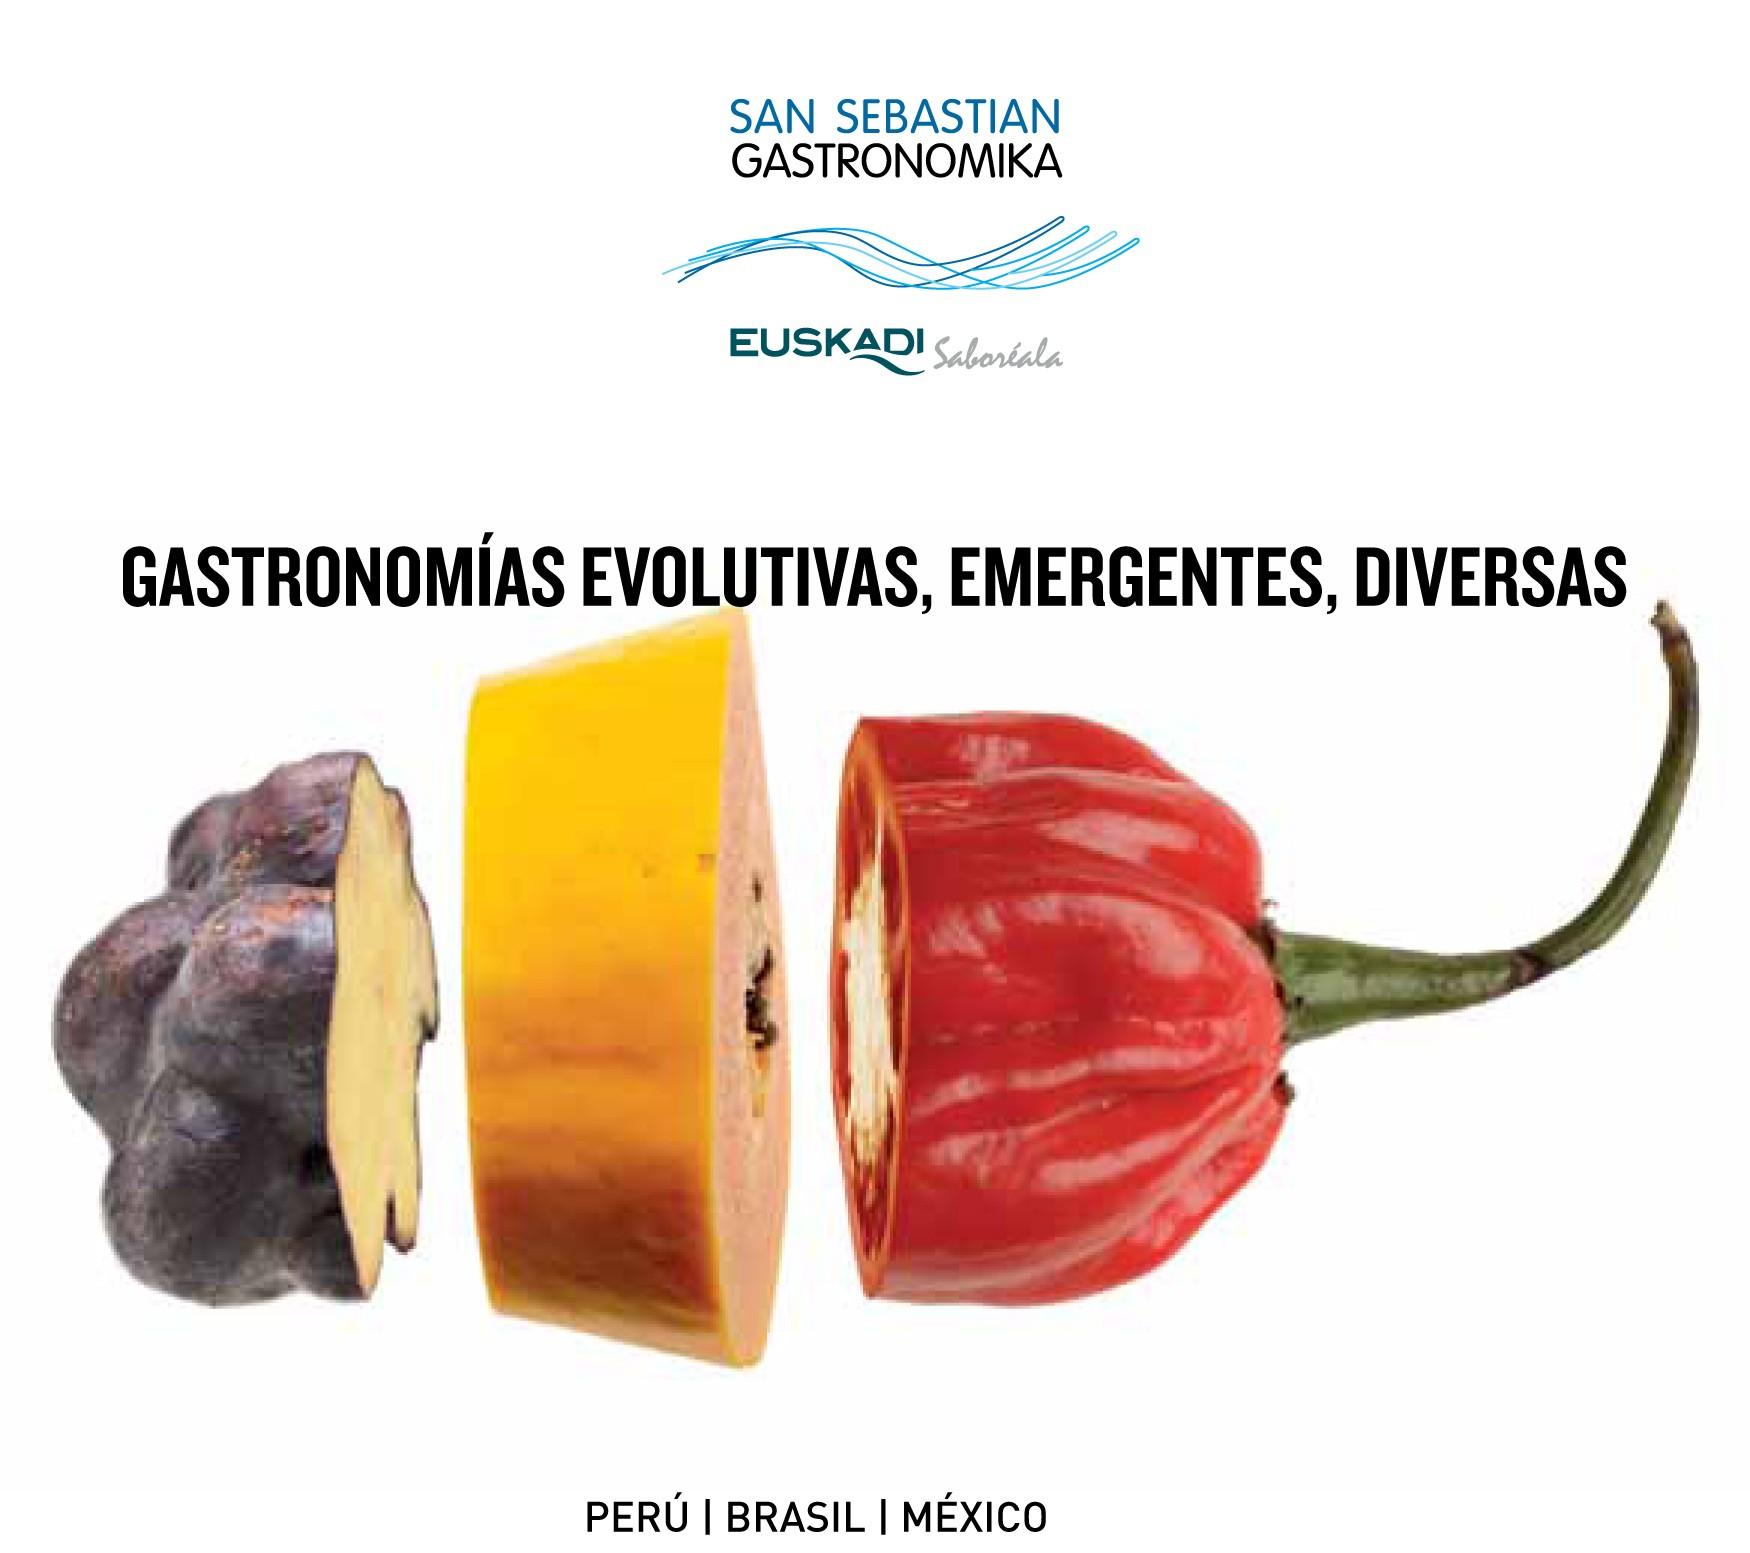 Cartel San Sebastian Gastronomika 2011